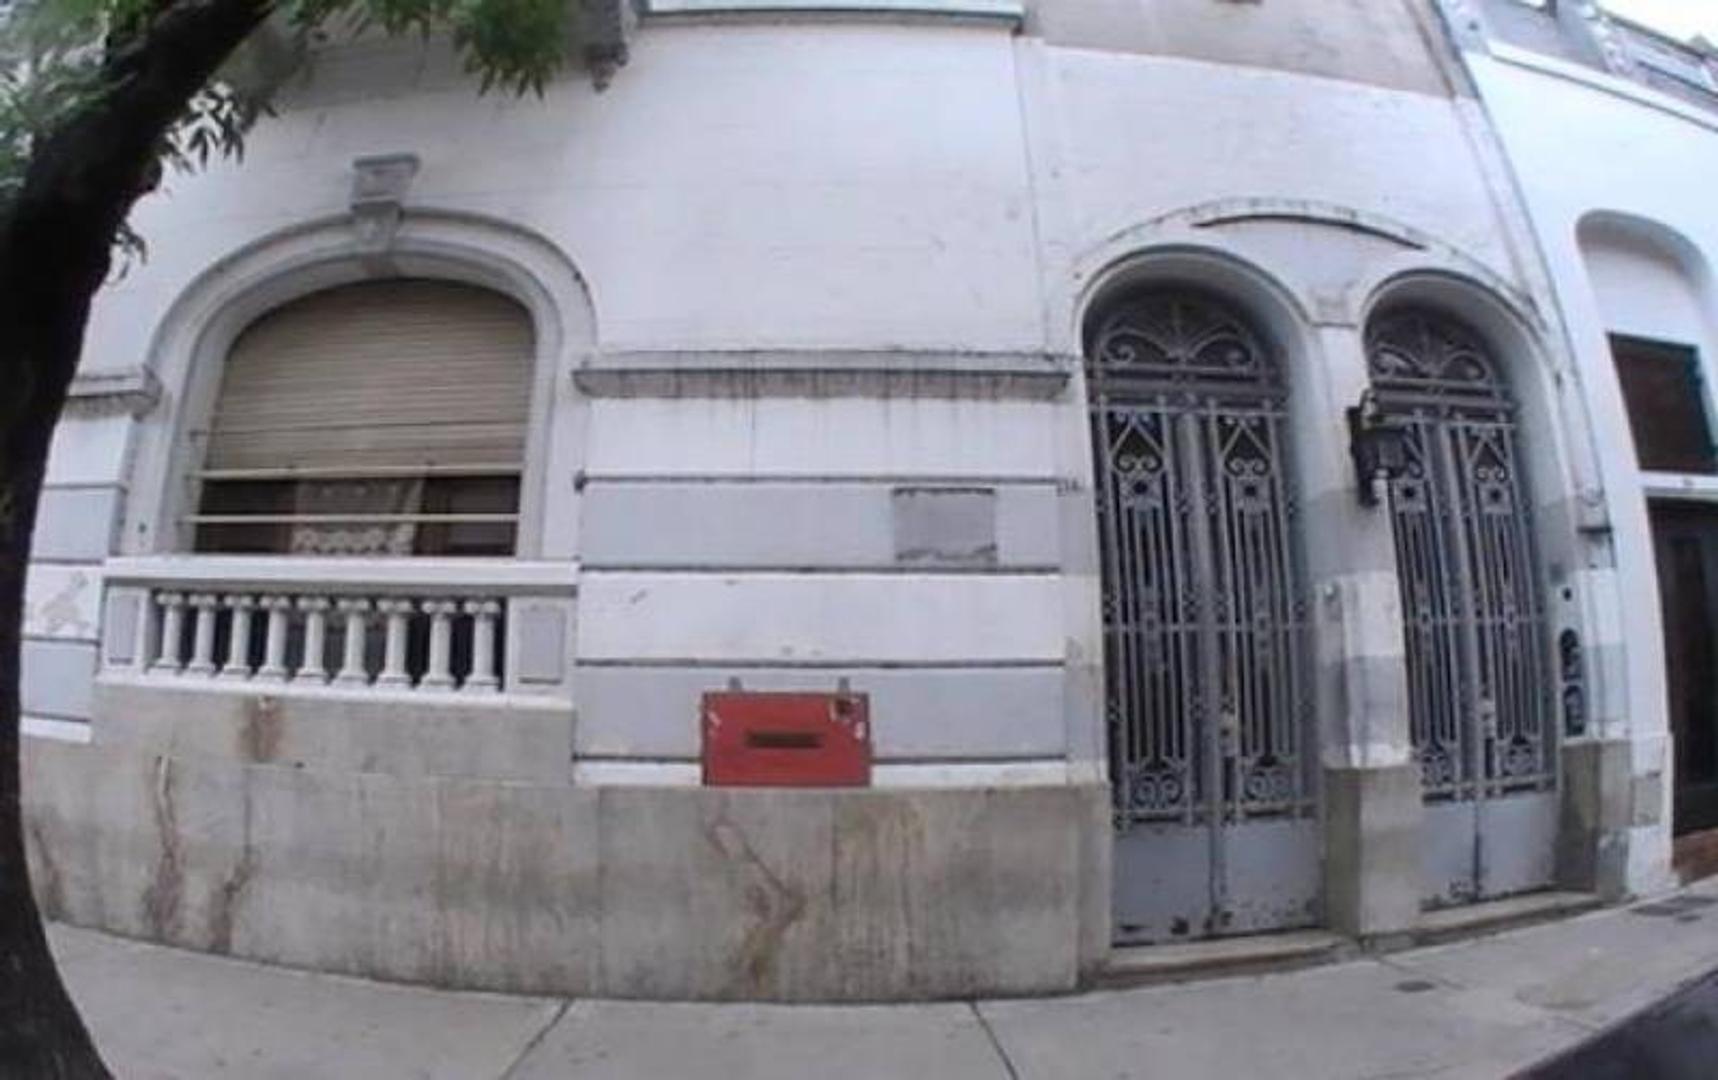 Casa en alquiler en gallo 700 almagro inmuebles clar n for Alquiler de casas baratas en sevilla capital